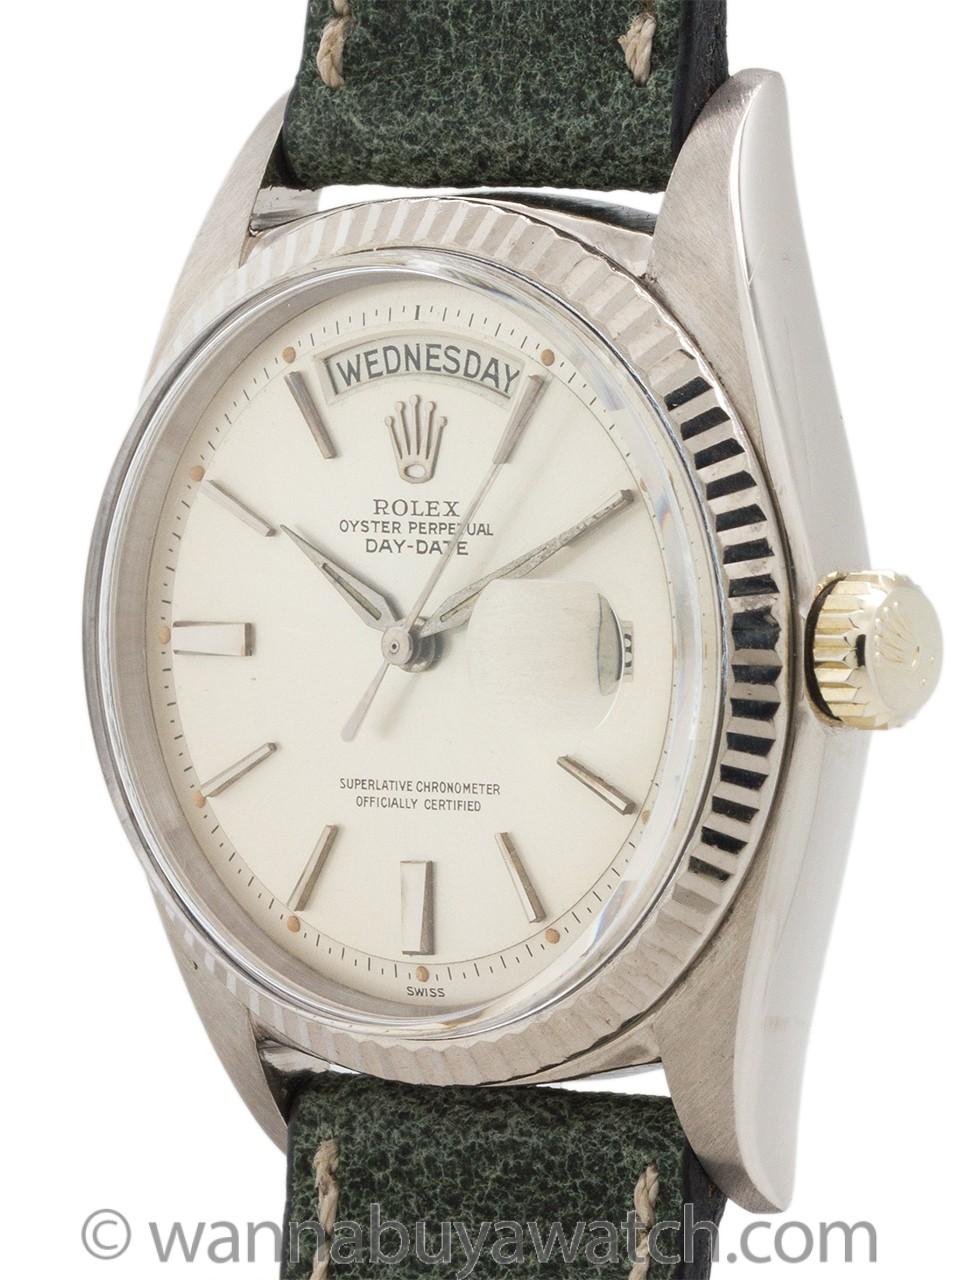 Rolex Day Date President ref 1803 18K WG circa 1963